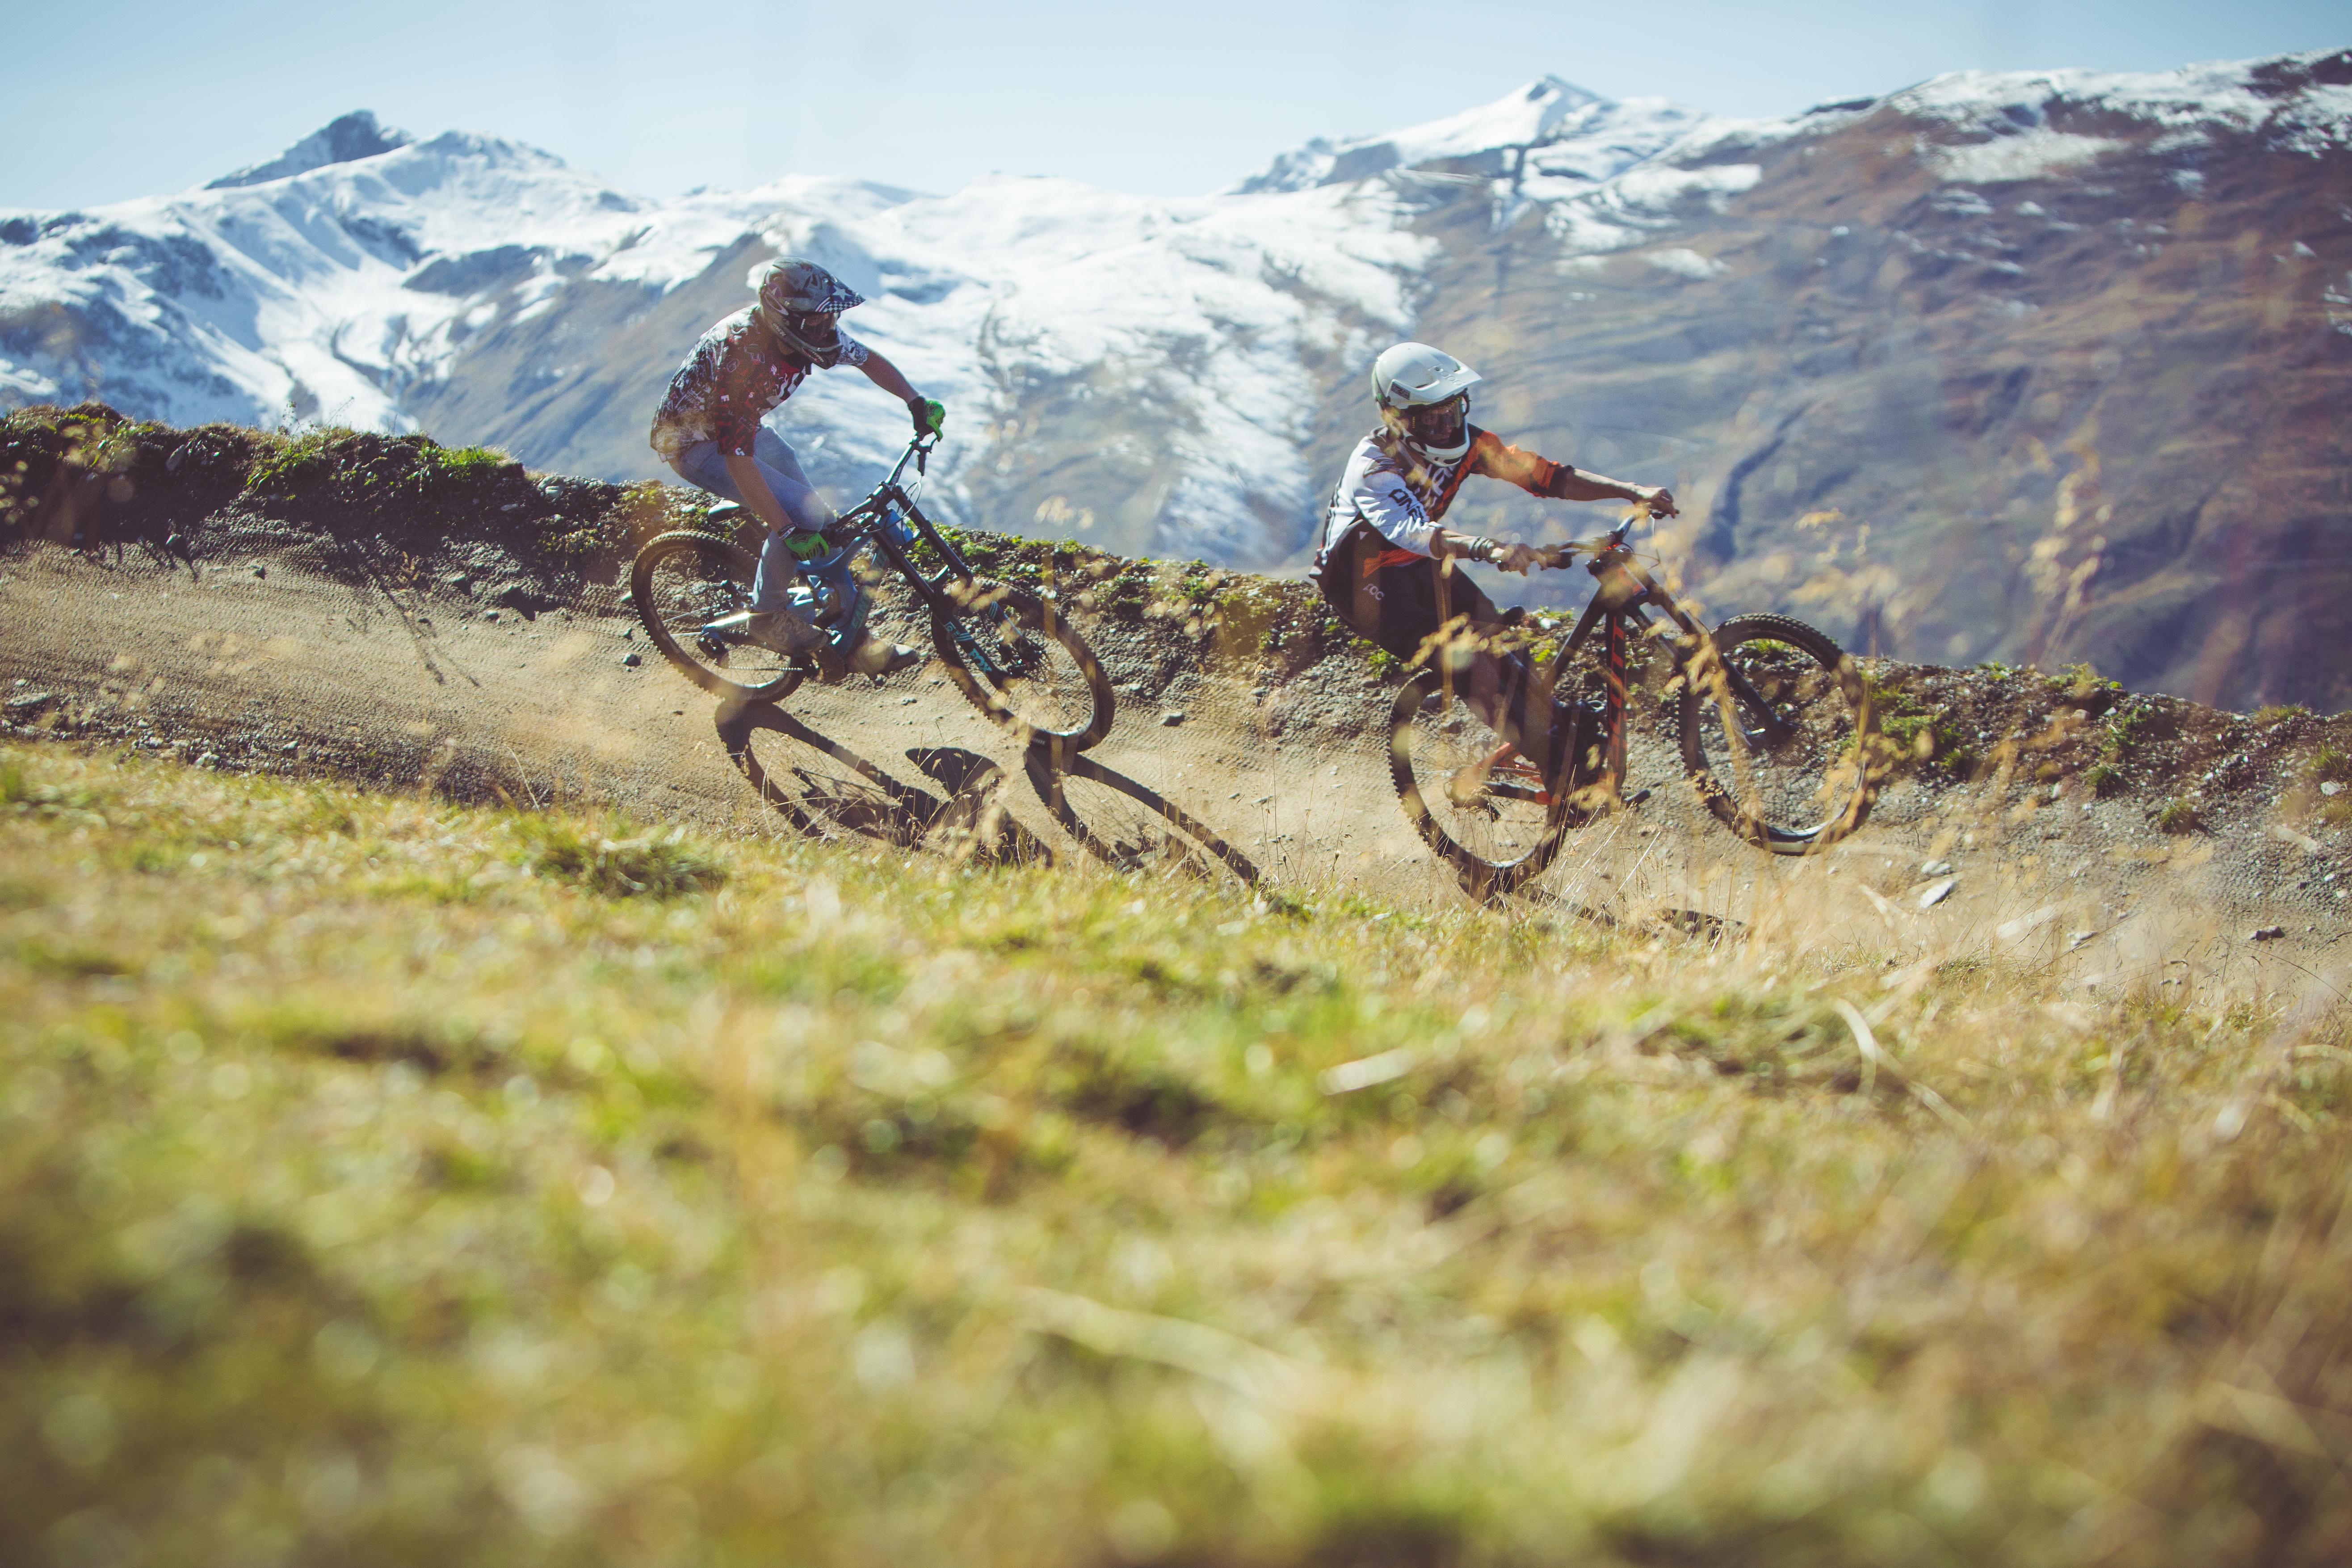 Apertura bikepark con due riders sui sentieri